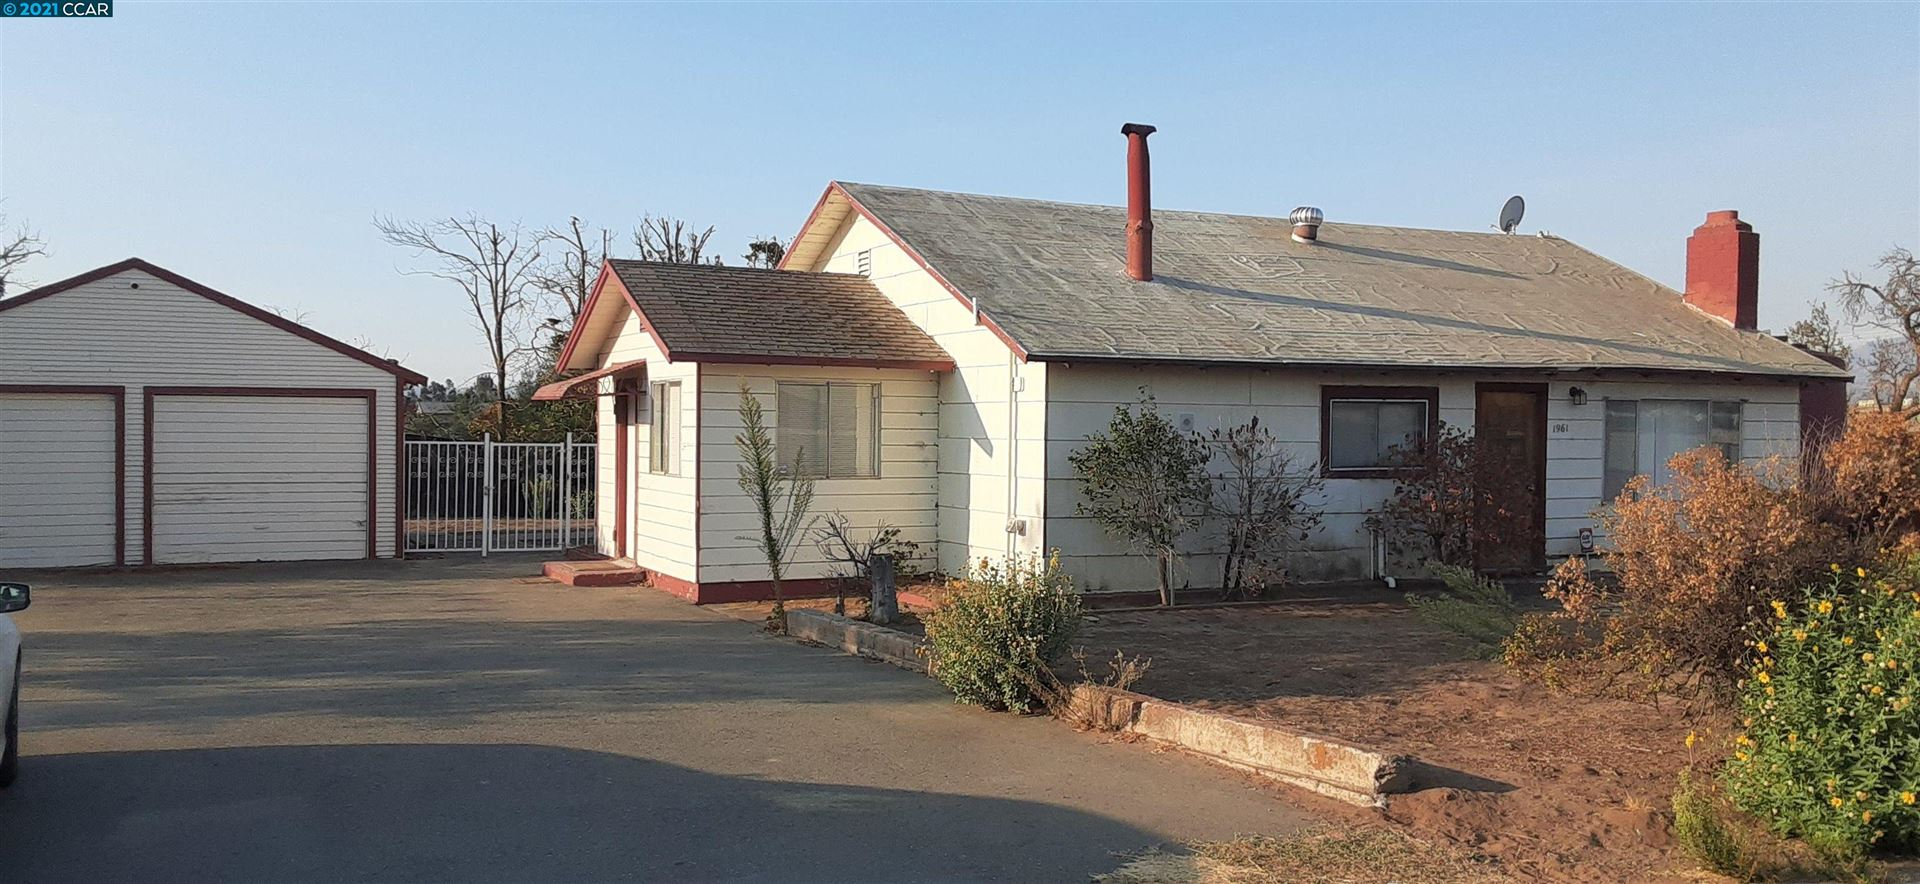 Photo of 1961 Carpenter, Oakley, CA 94561 (MLS # 40968662)